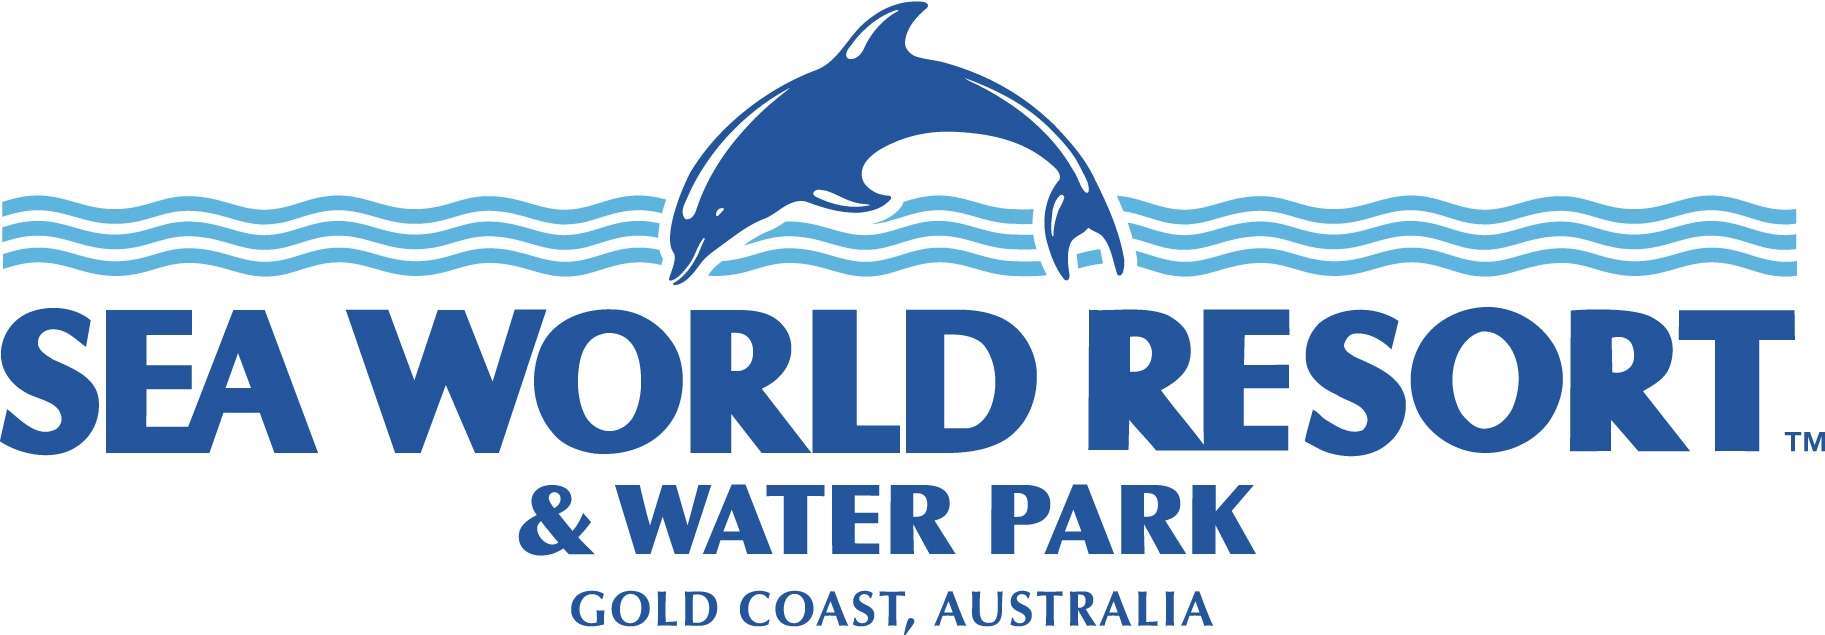 Seaworld Resort and Water Park